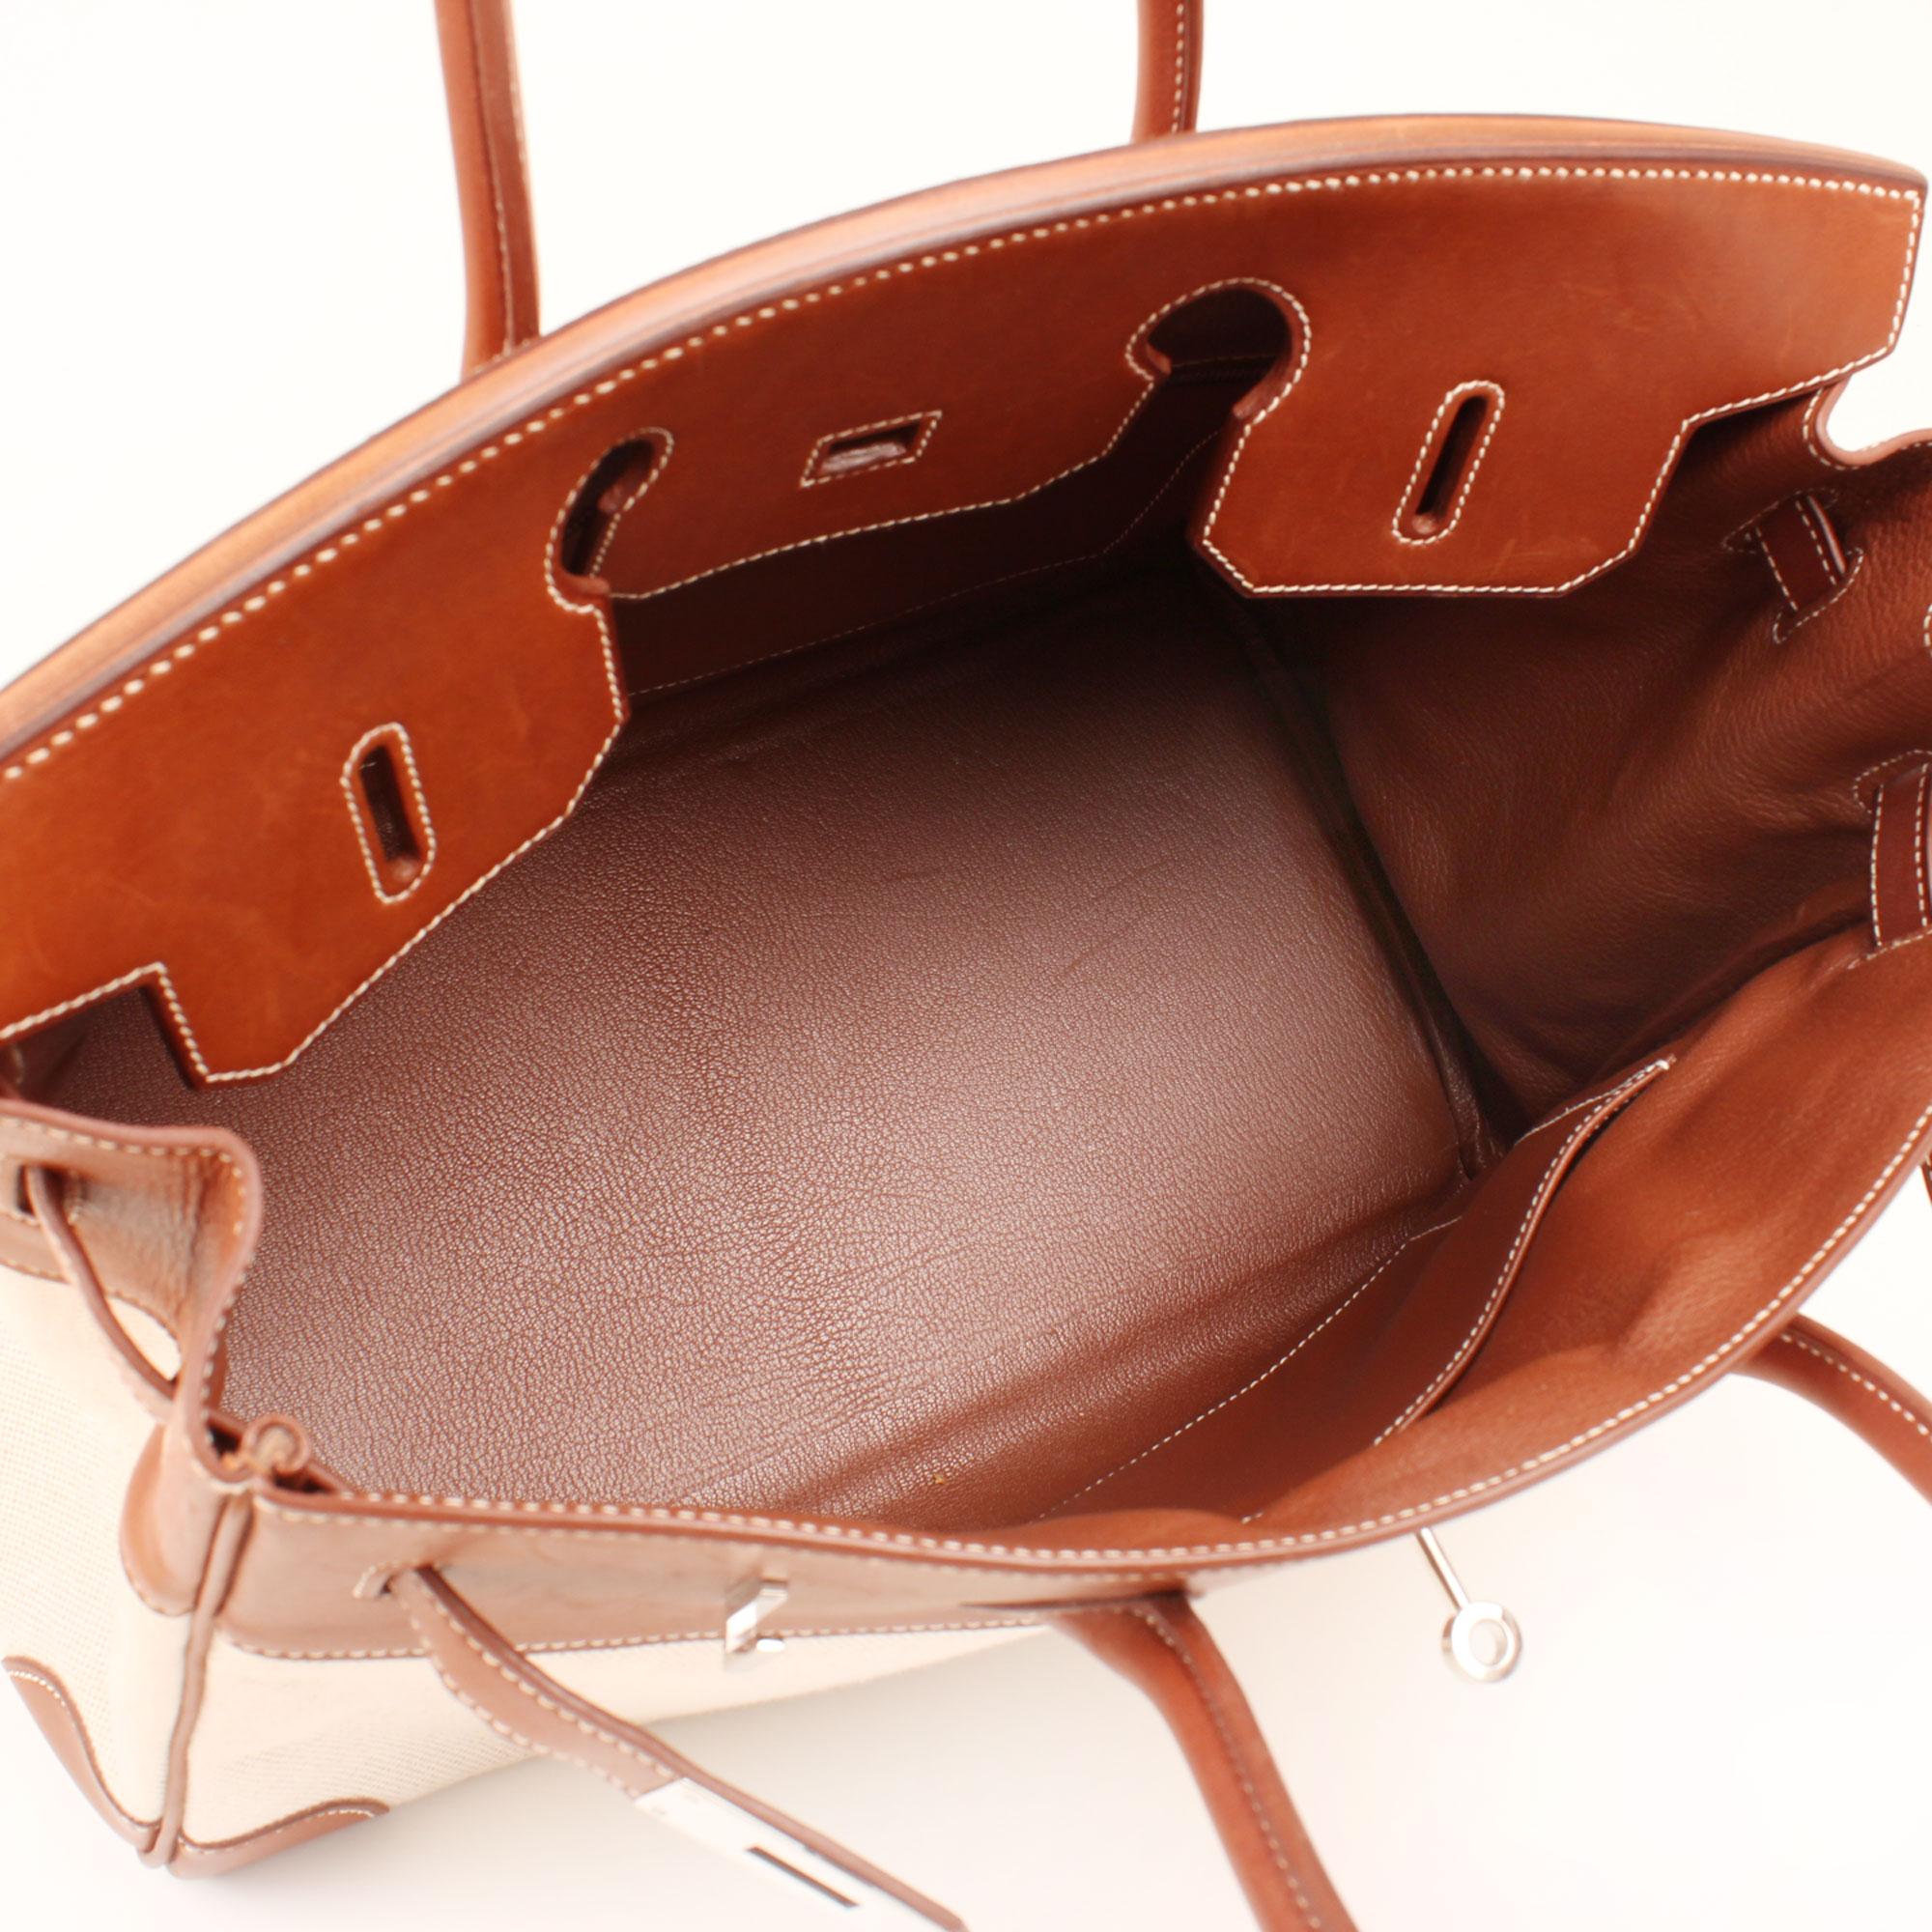 Imagen del interior del bolso hermes birkin 35 barenia lona